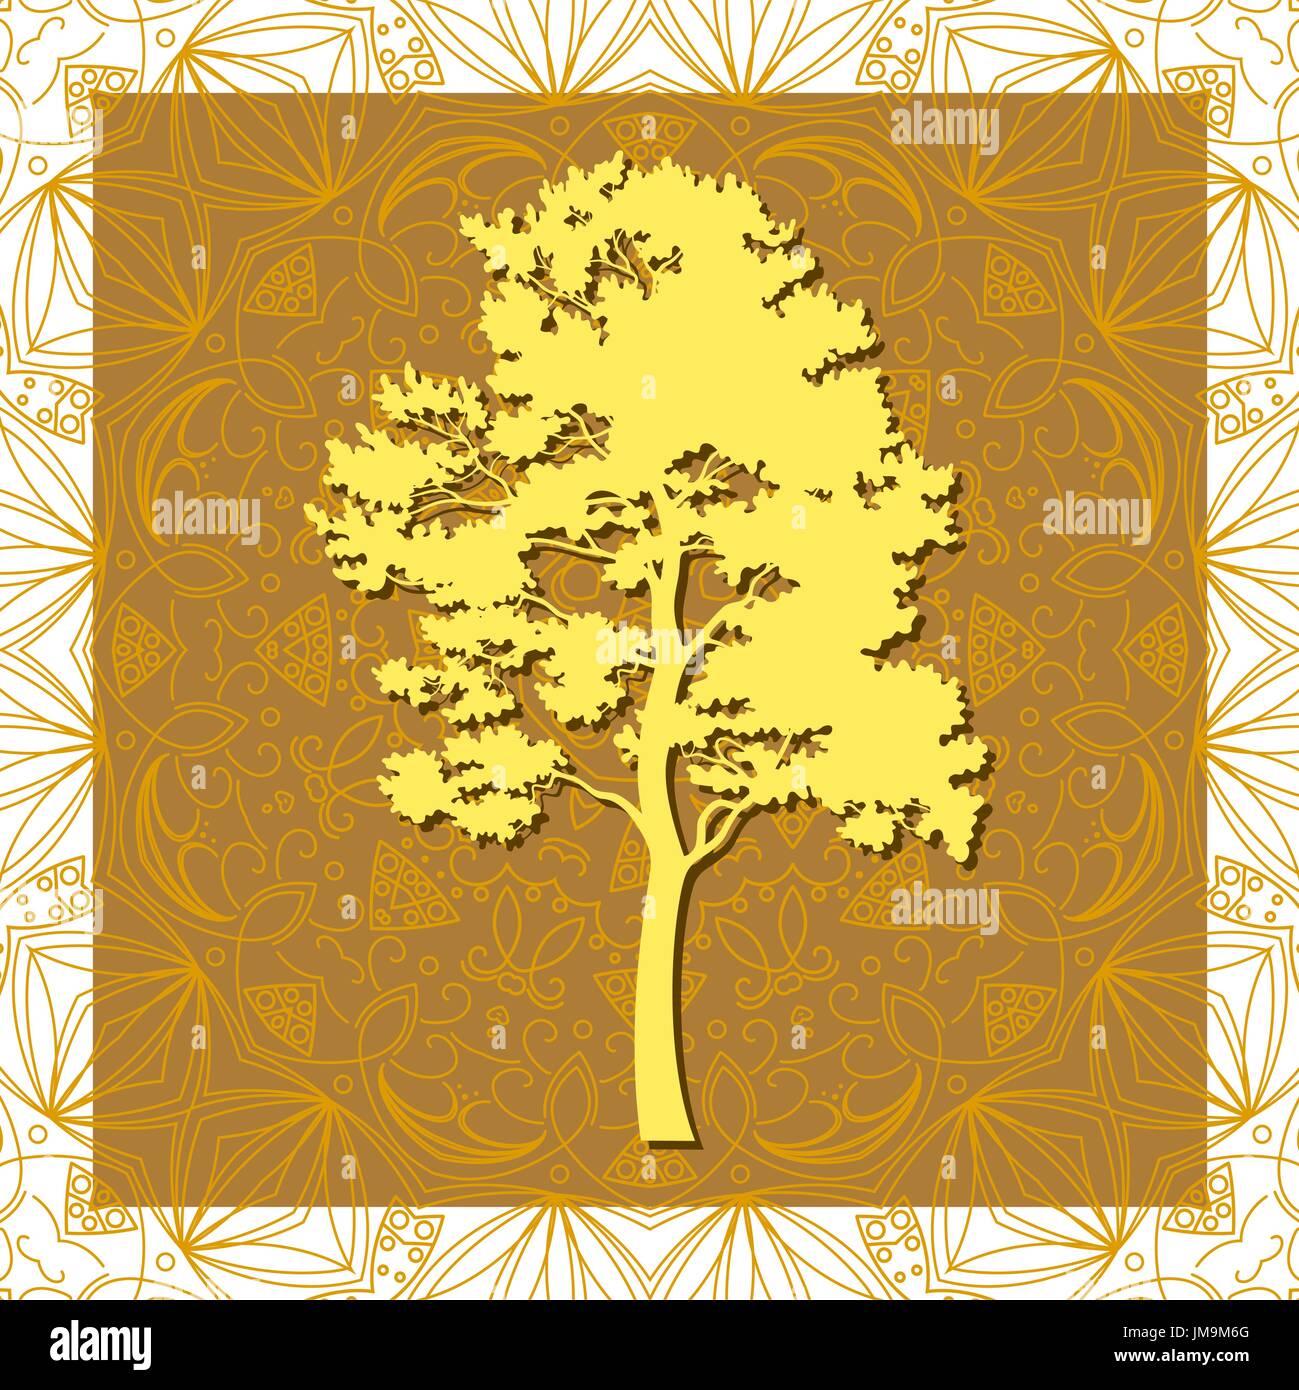 Pine Tree Silhouettes - Stock Vector